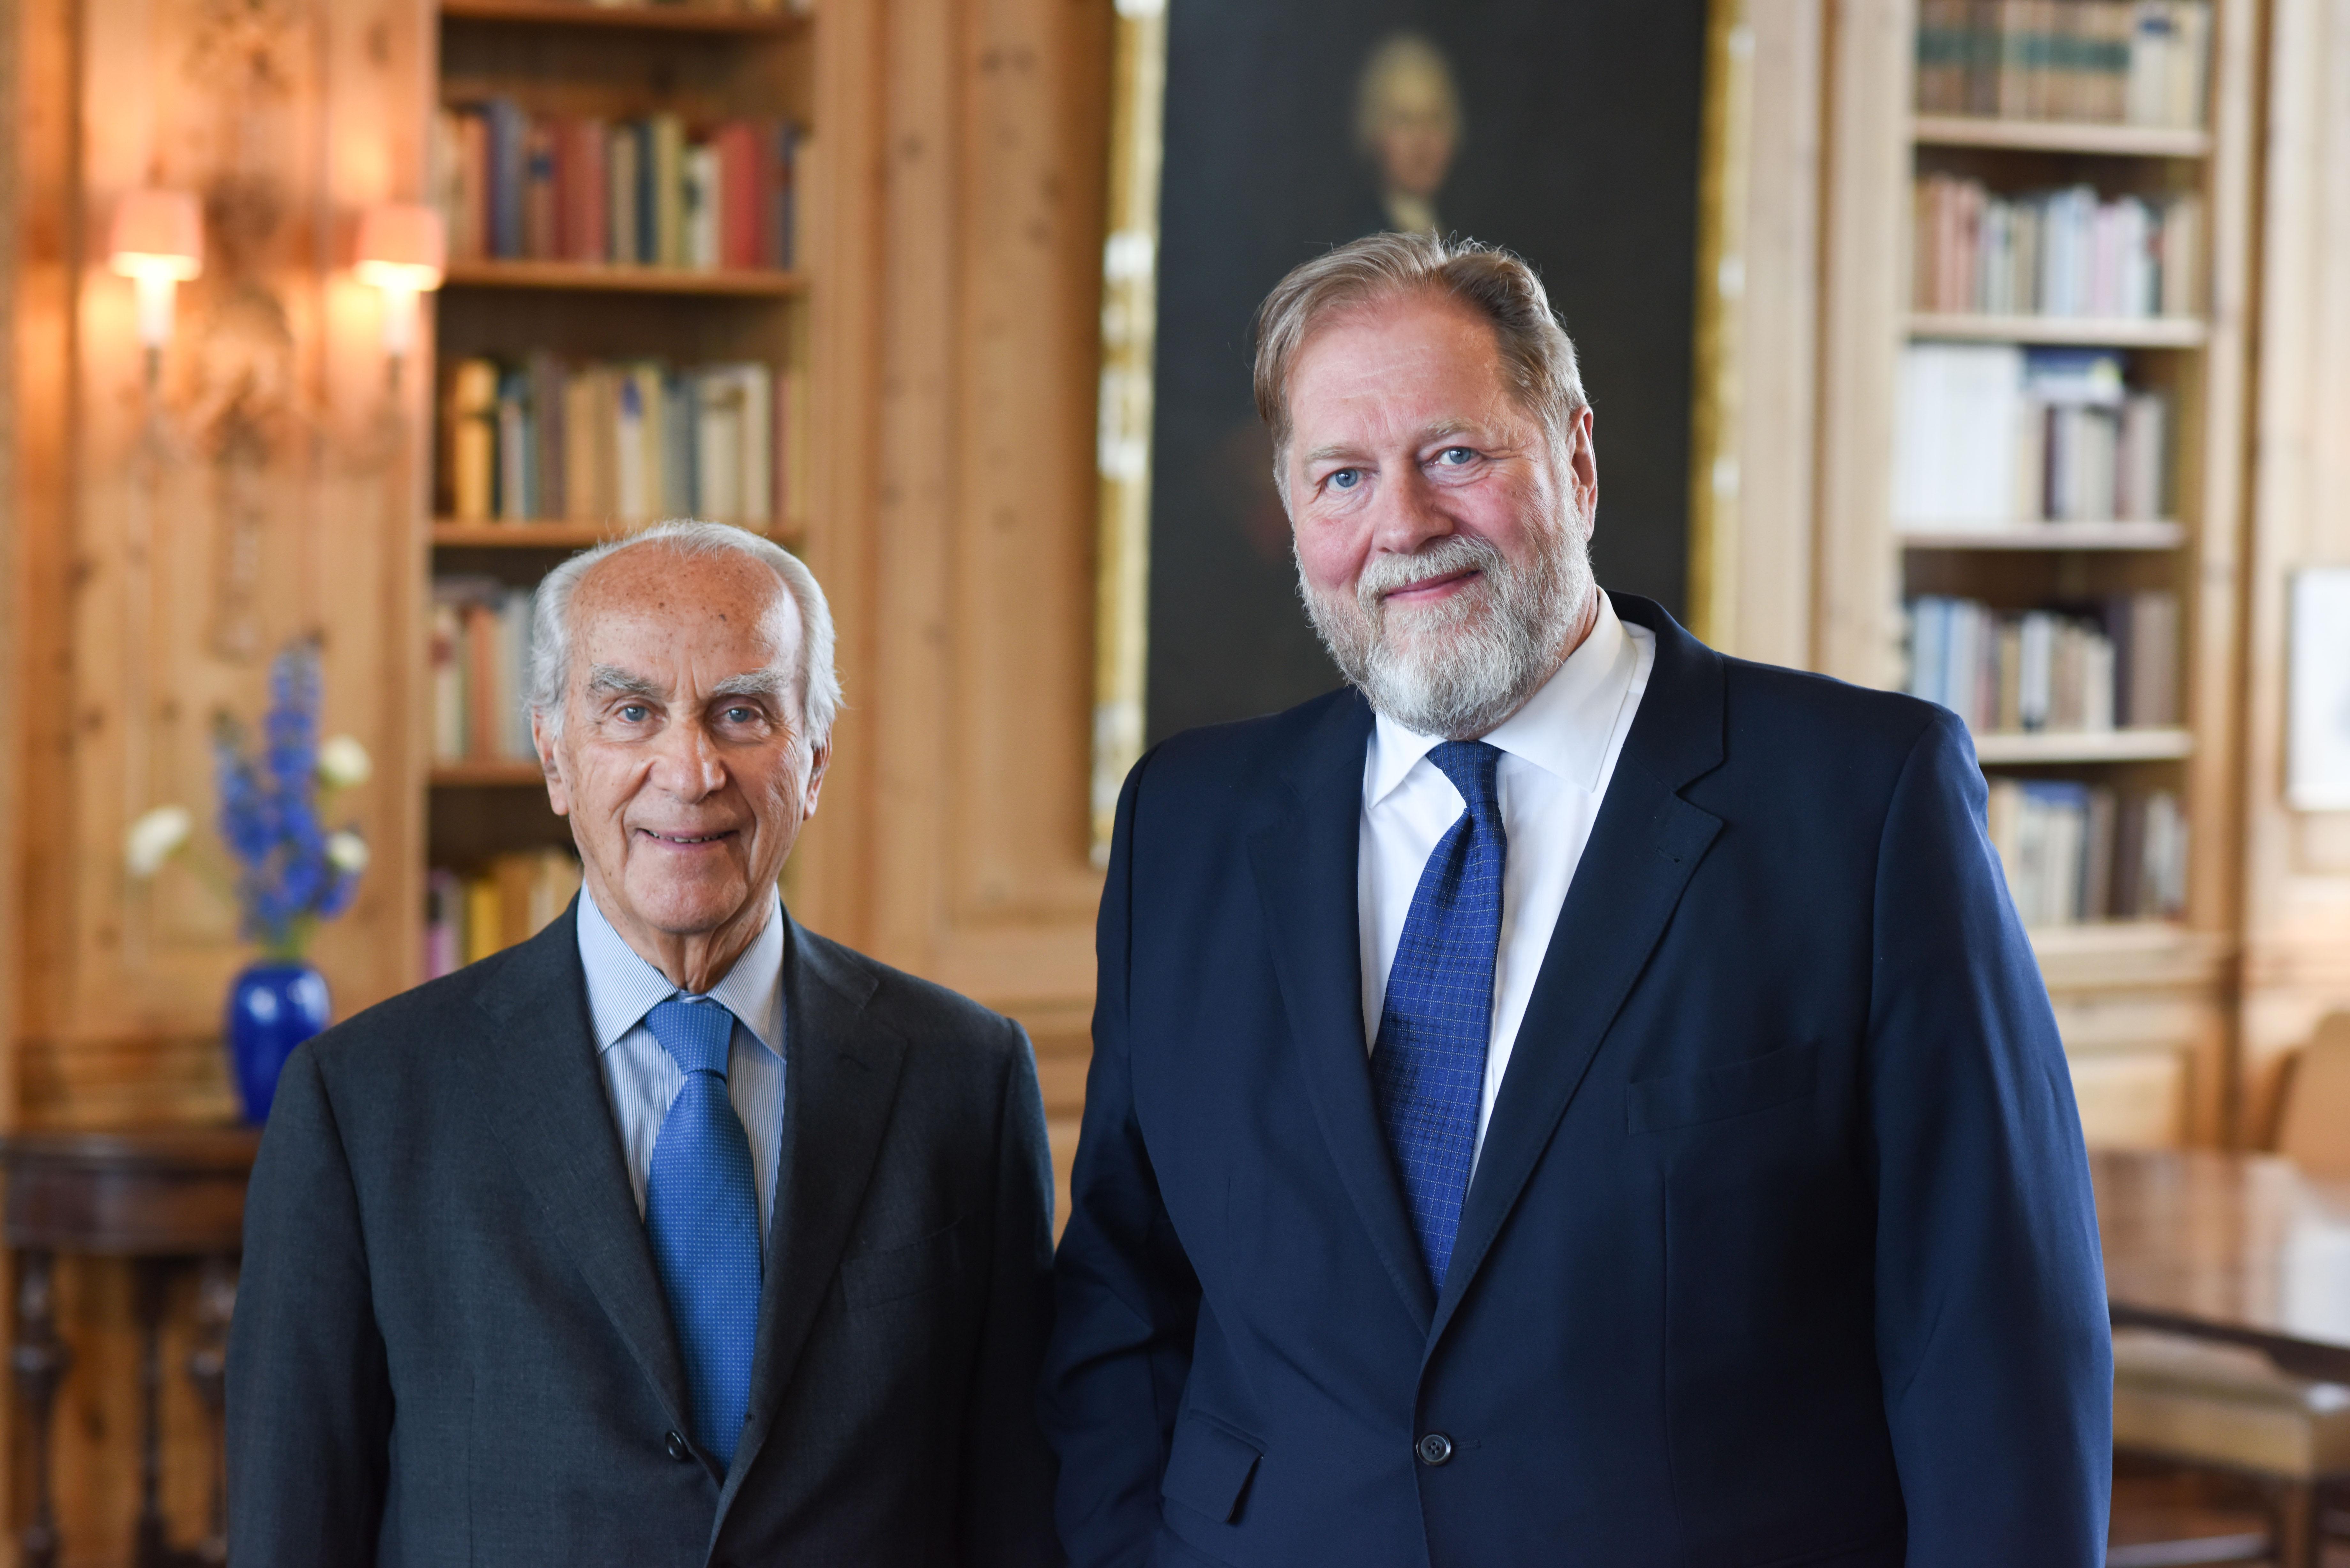 Berlin, 2.5.2017 Verleihung des Axel-Springer Award an Sir Tim Bernes-Lee. Unter den Gästen: Viva Gründer Dieter Gorny und Giuseppe Vita